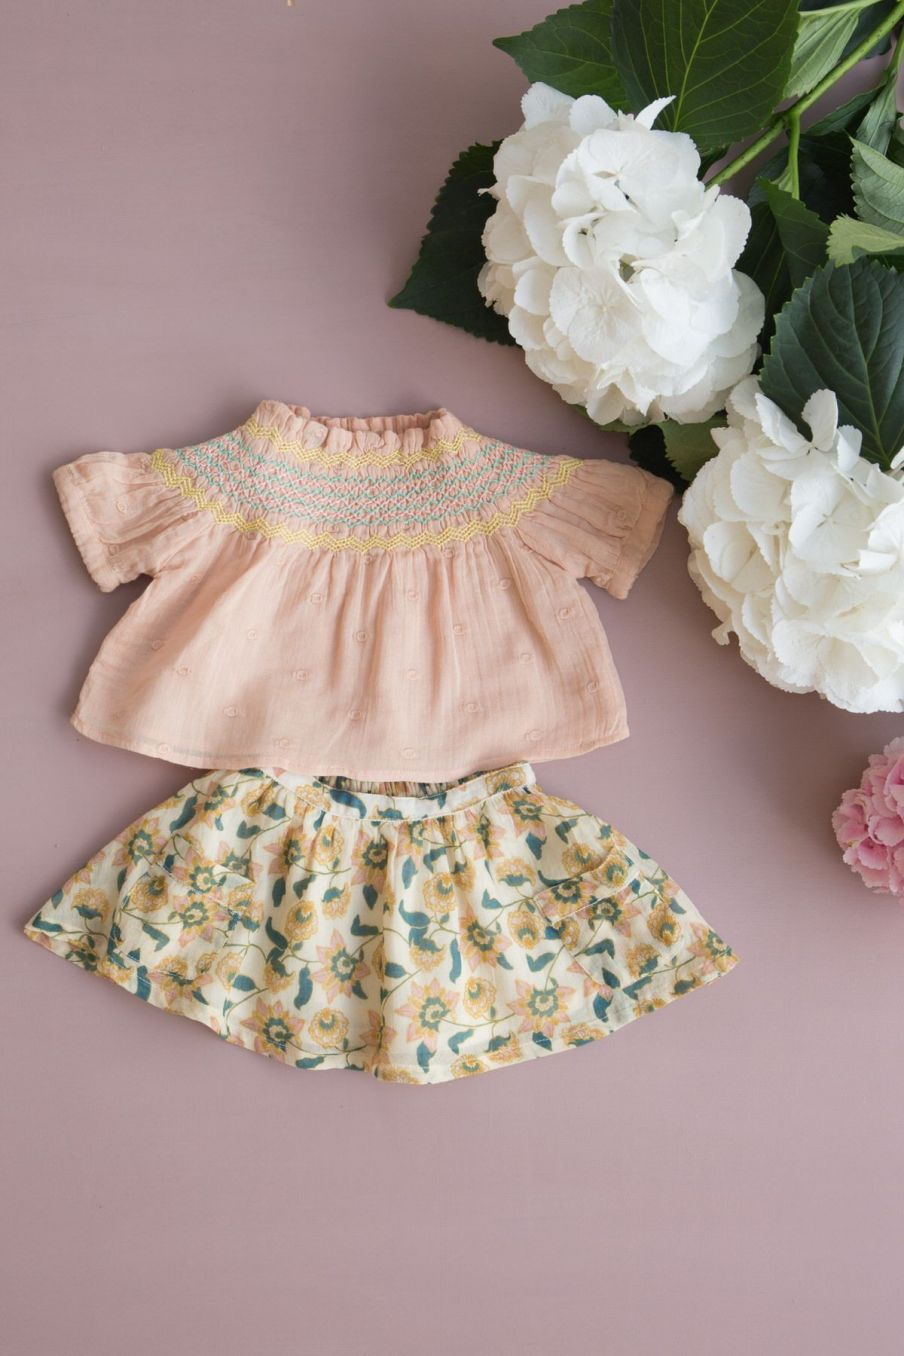 boheme chic vintage blouse bébé fille tyra sienna plumetis